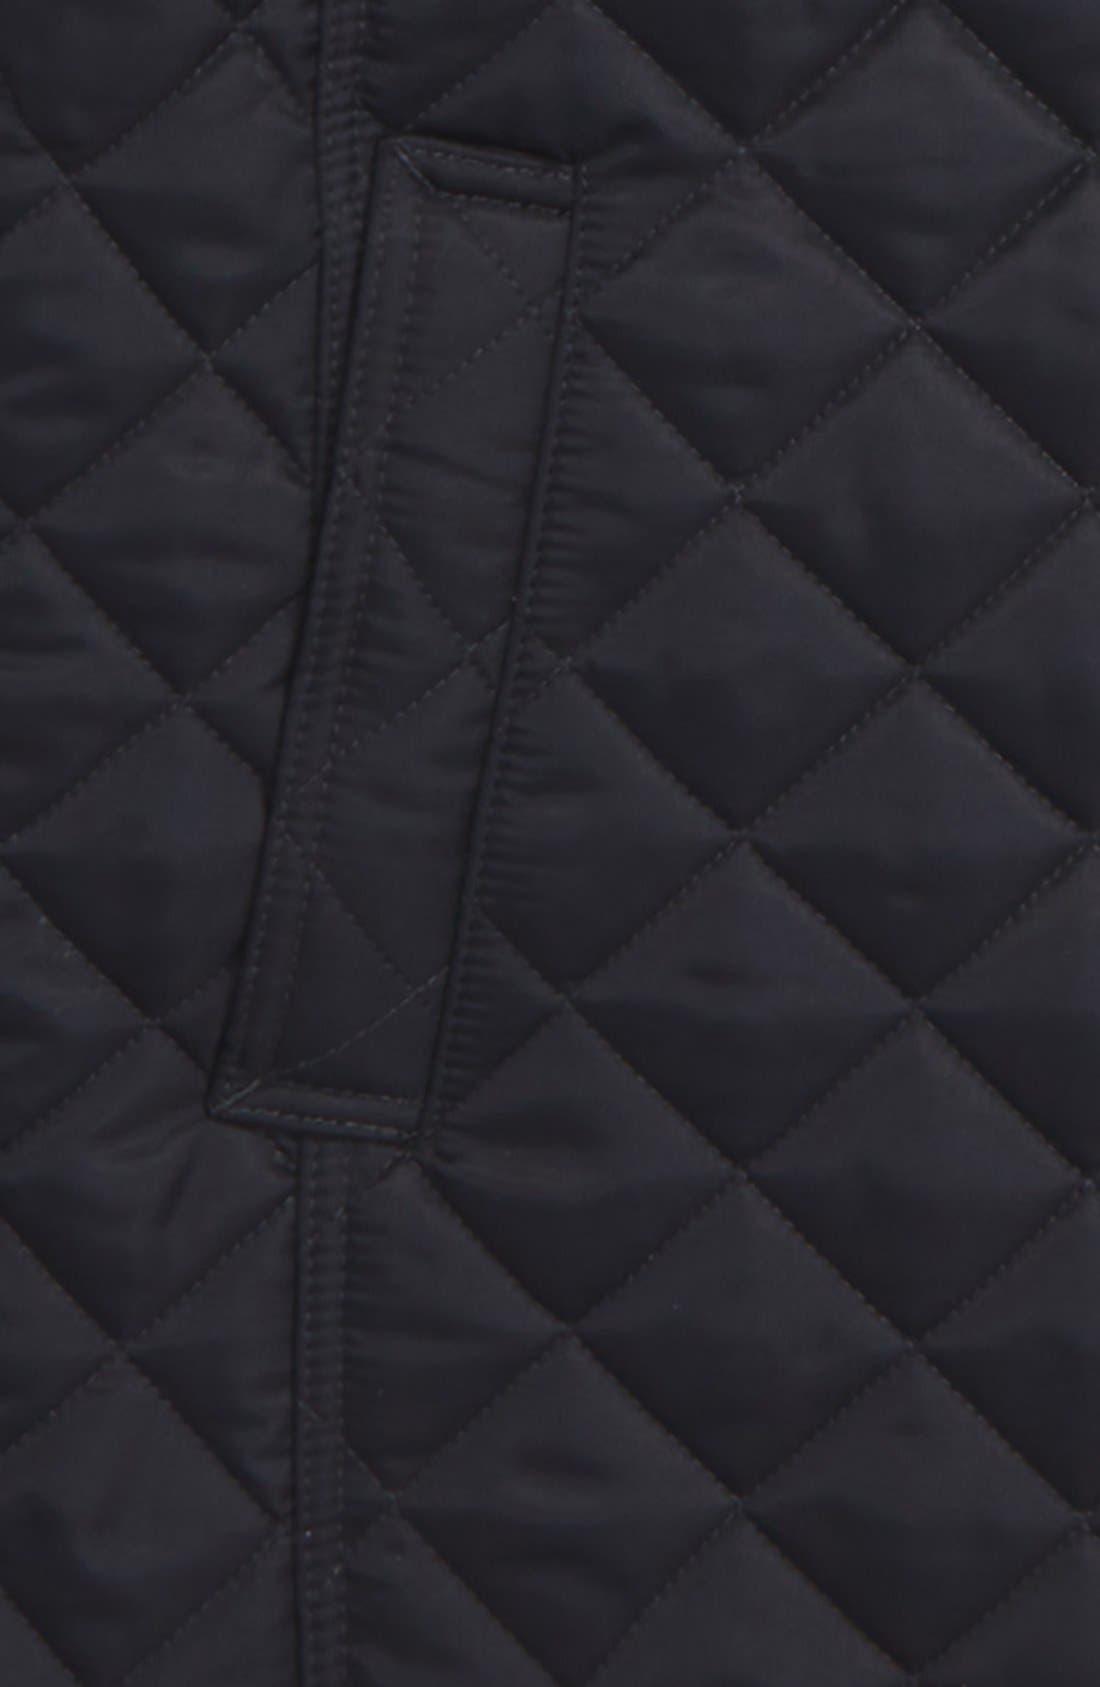 BURBERRY,                             'Mini Ashurst' Quilted Jacket,                             Alternate thumbnail 2, color,                             410